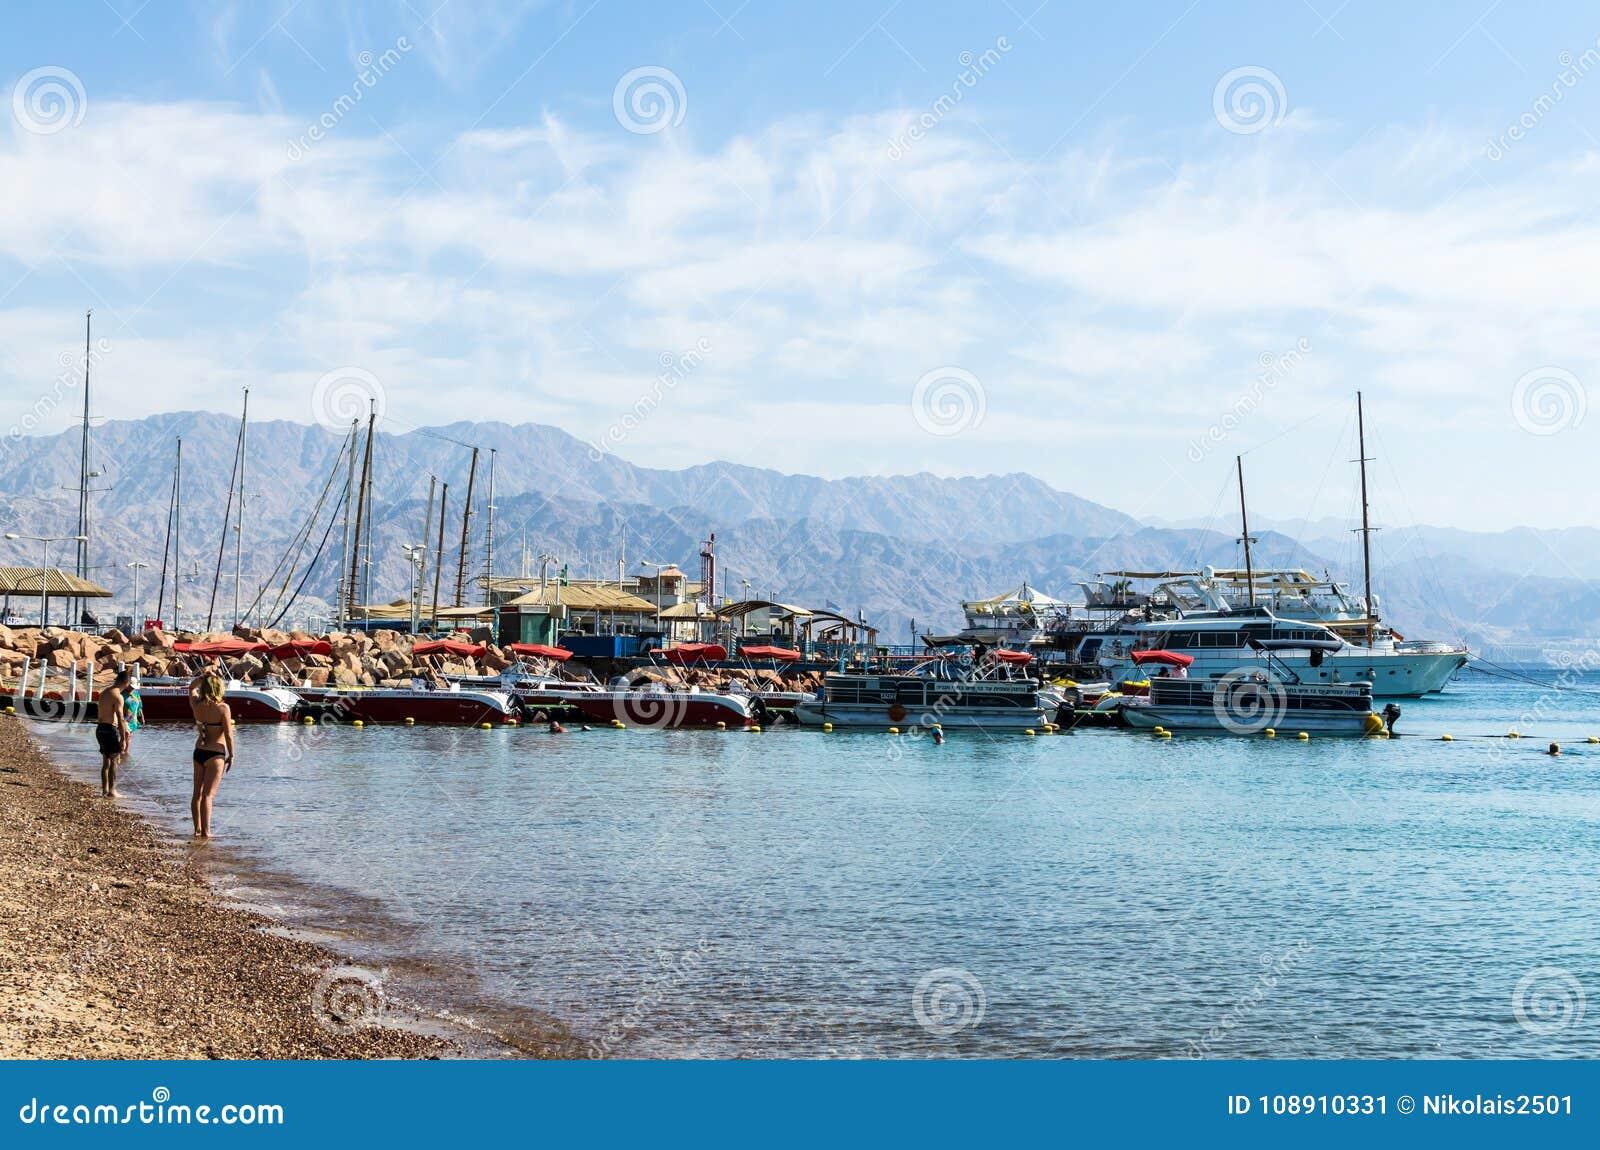 EILAT, ISRAEL – November 7, 2017: Marina with docked yachts